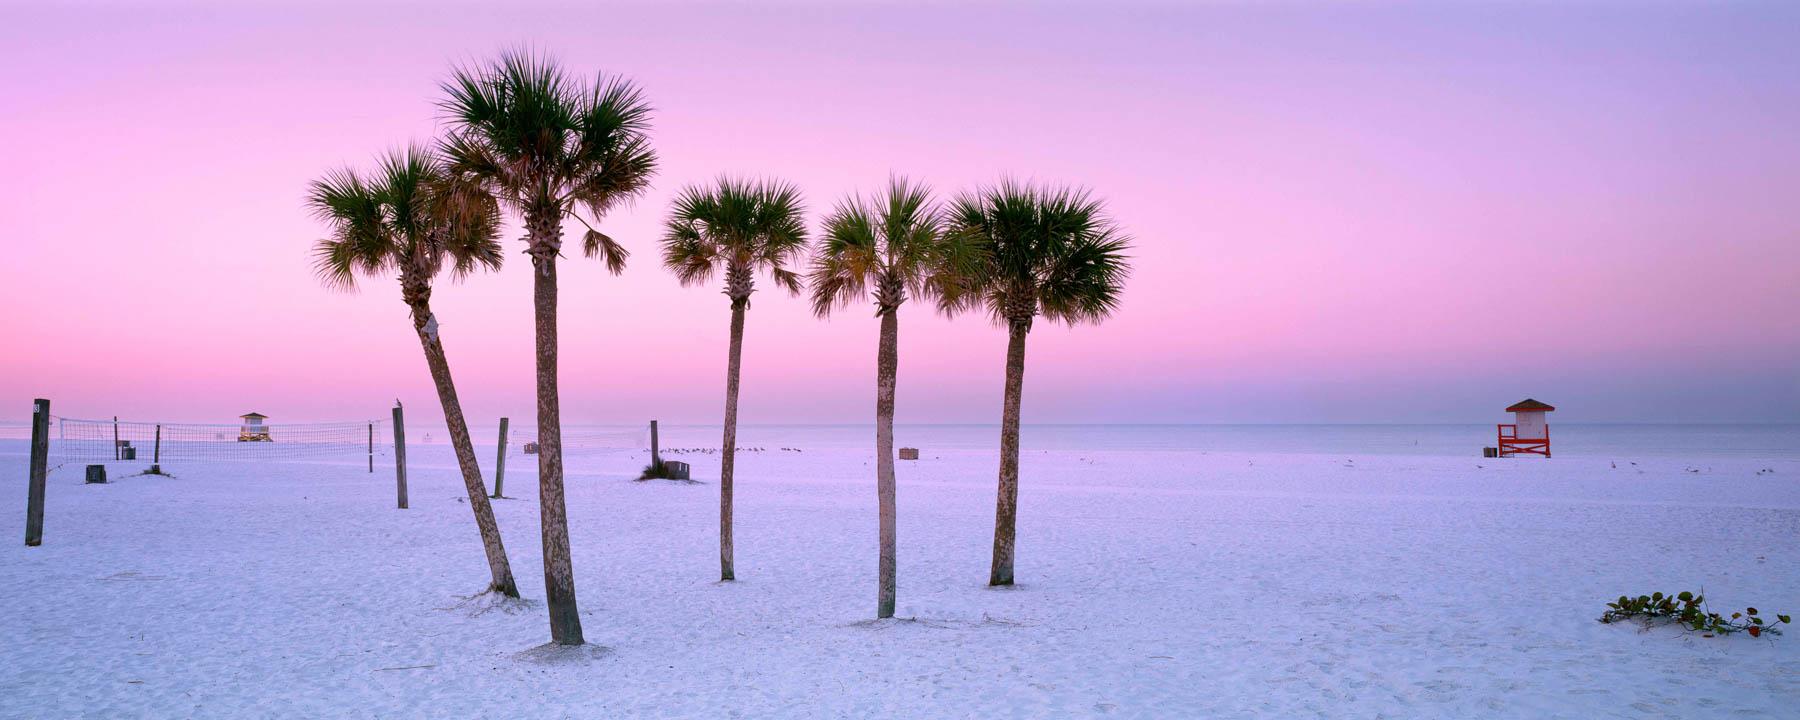 Siesta Beach, Florida, USA